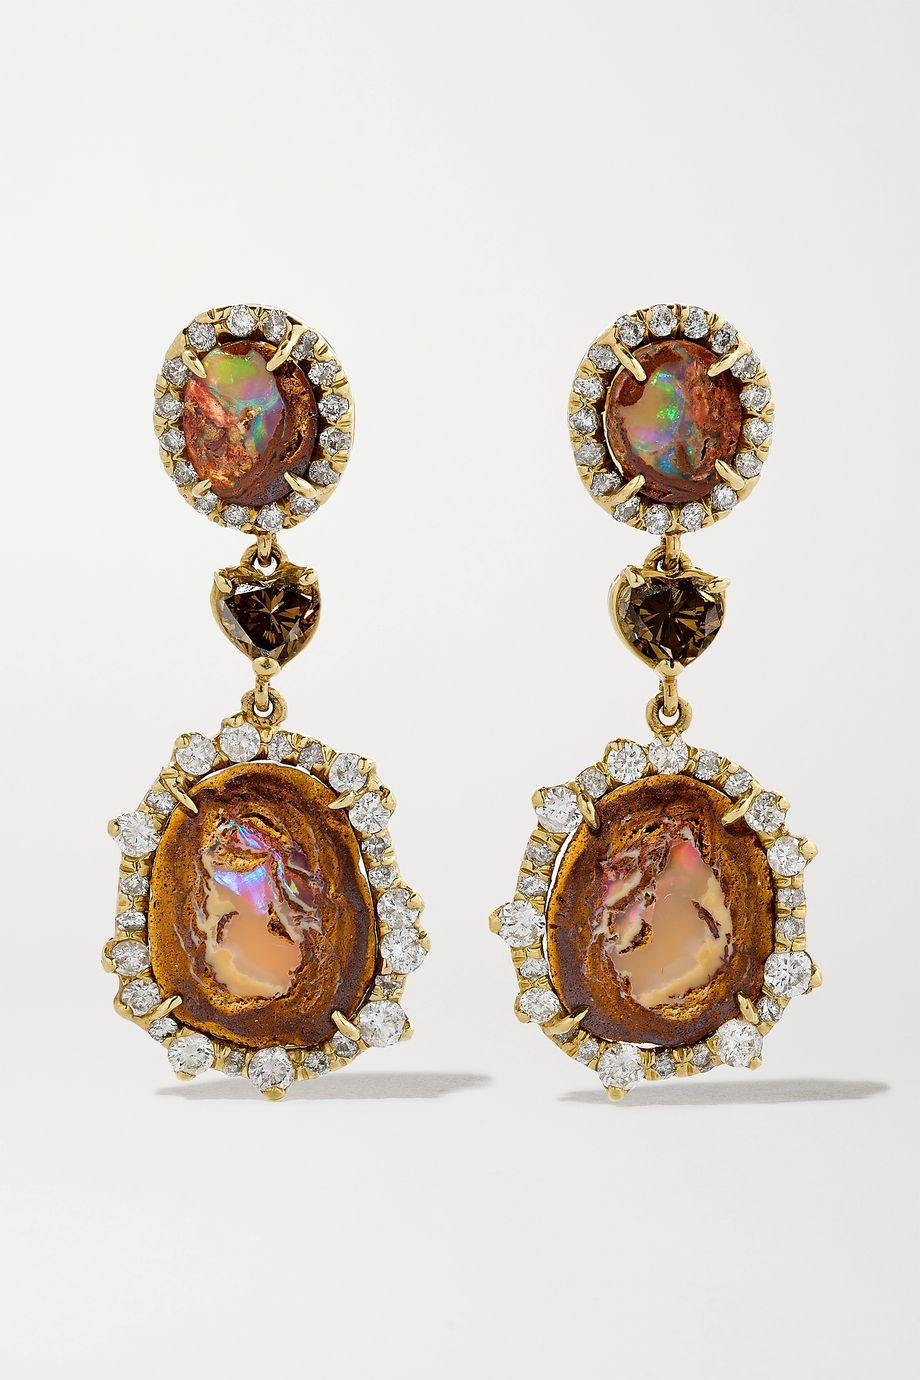 Kimberly McDonald 18-karat green gold, opal and diamond earrings